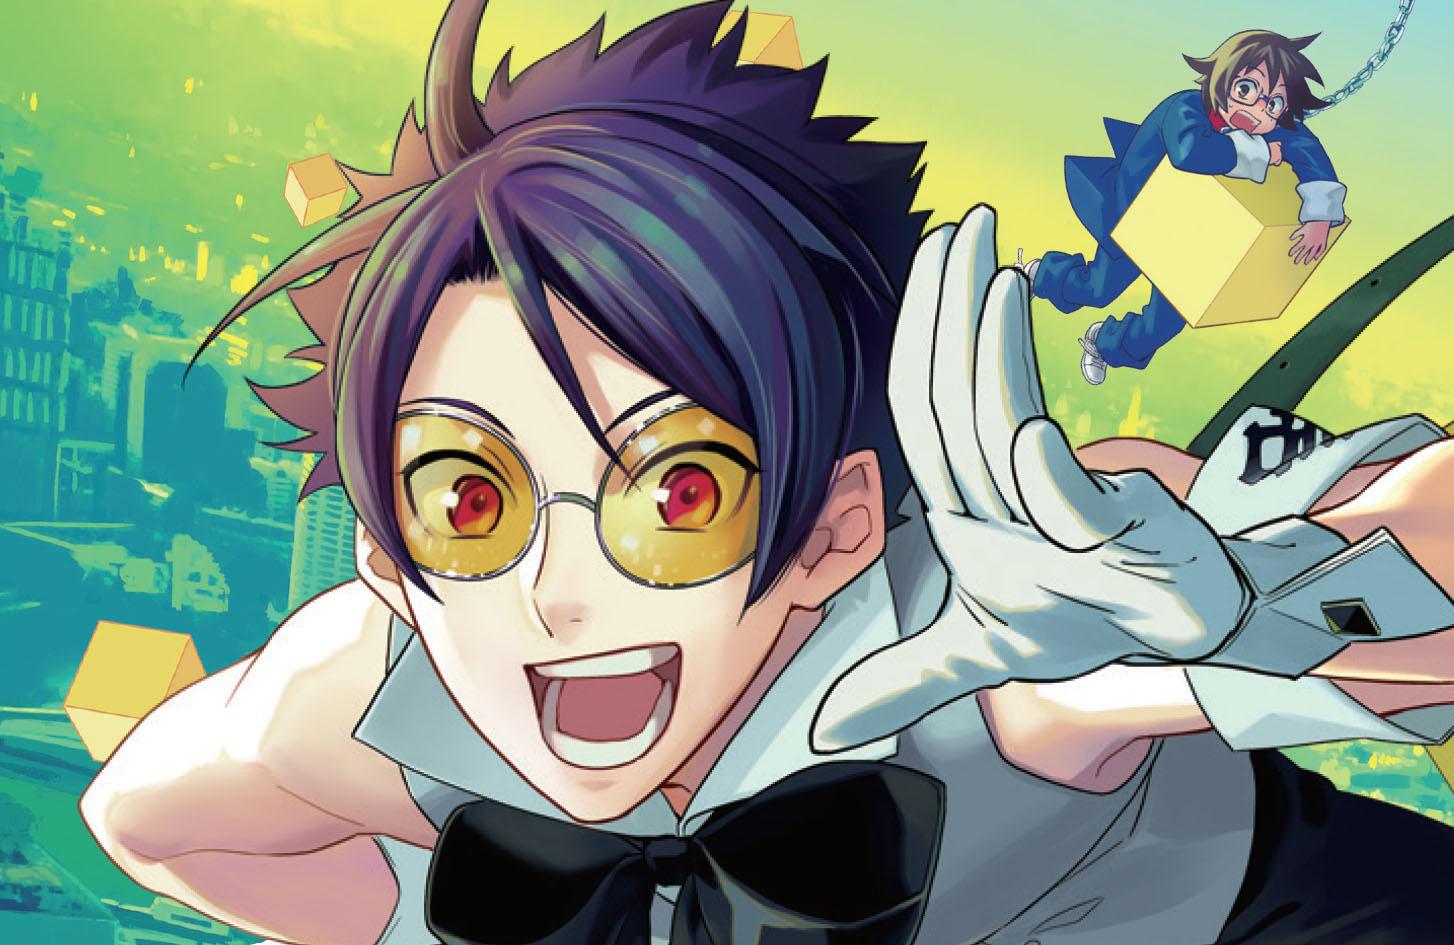 shinigami doggy manga recenzja waneko